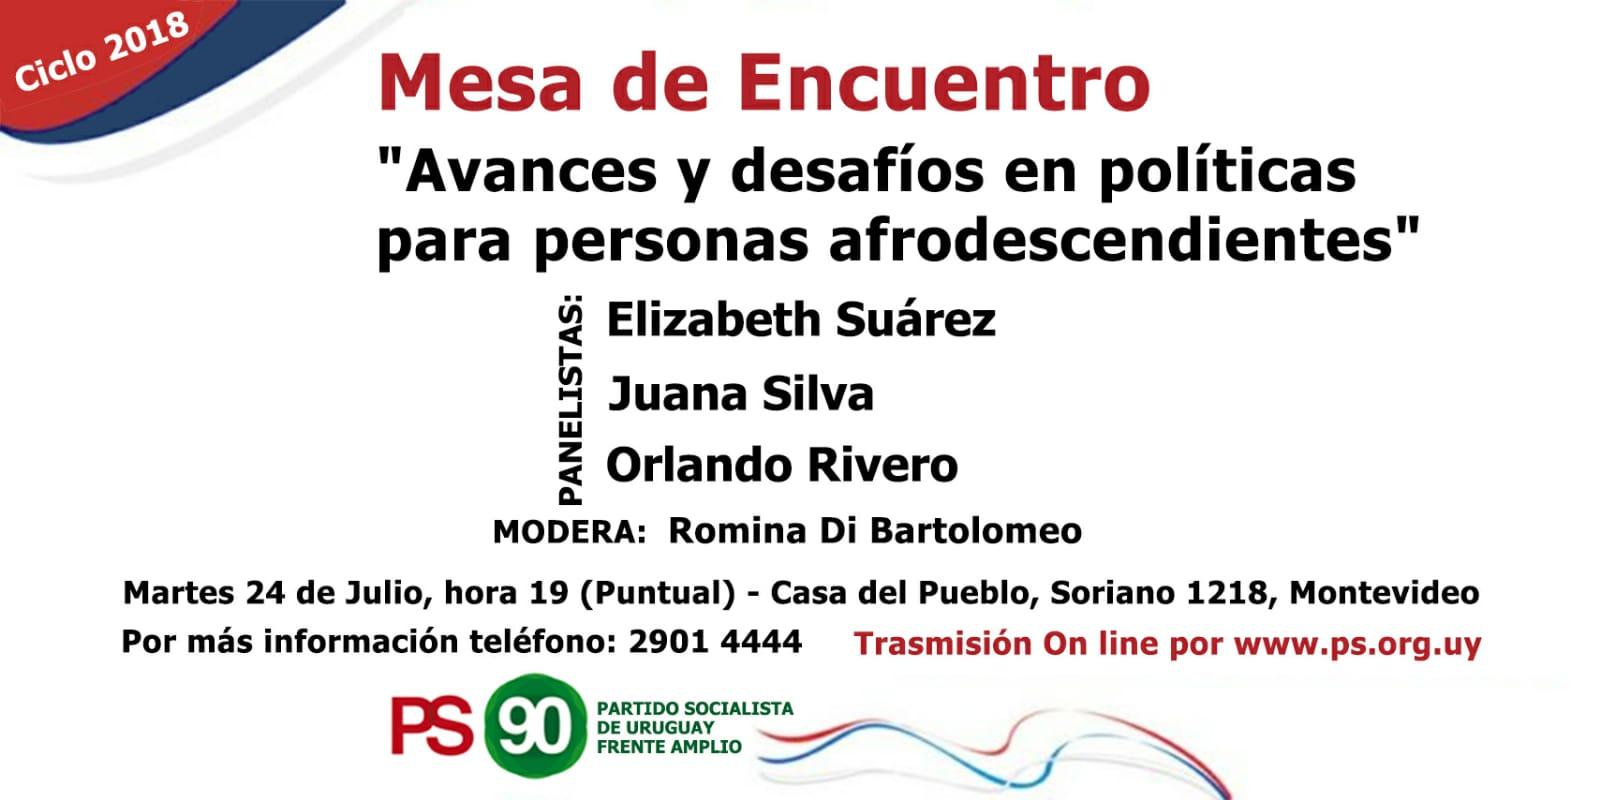 #MesaDeEncuentro